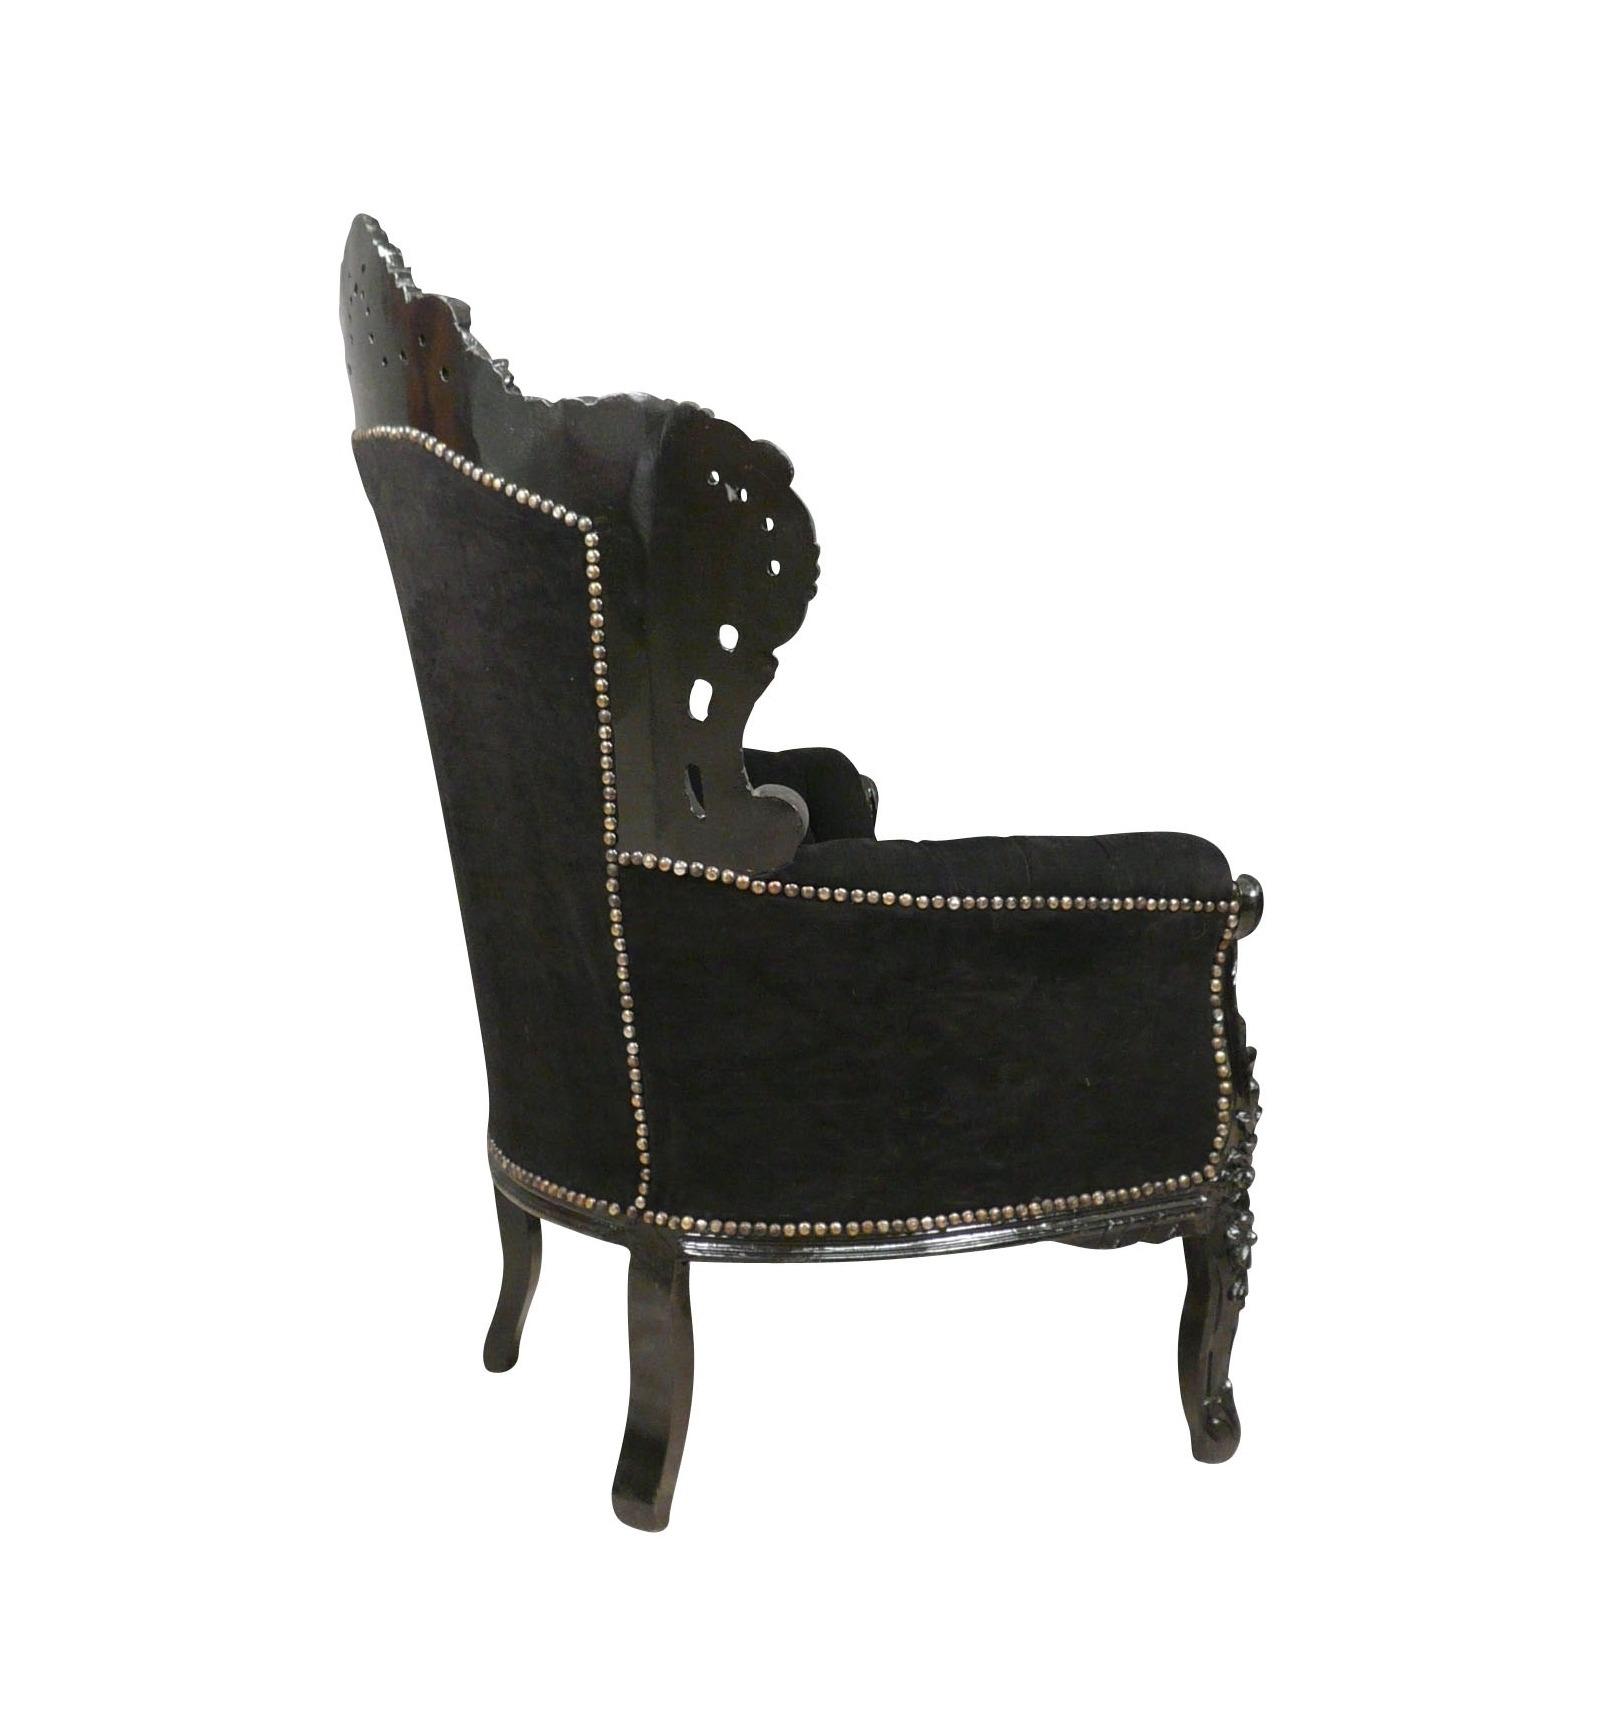 Barock Sessel schwarz Möbel und Barock Stühle